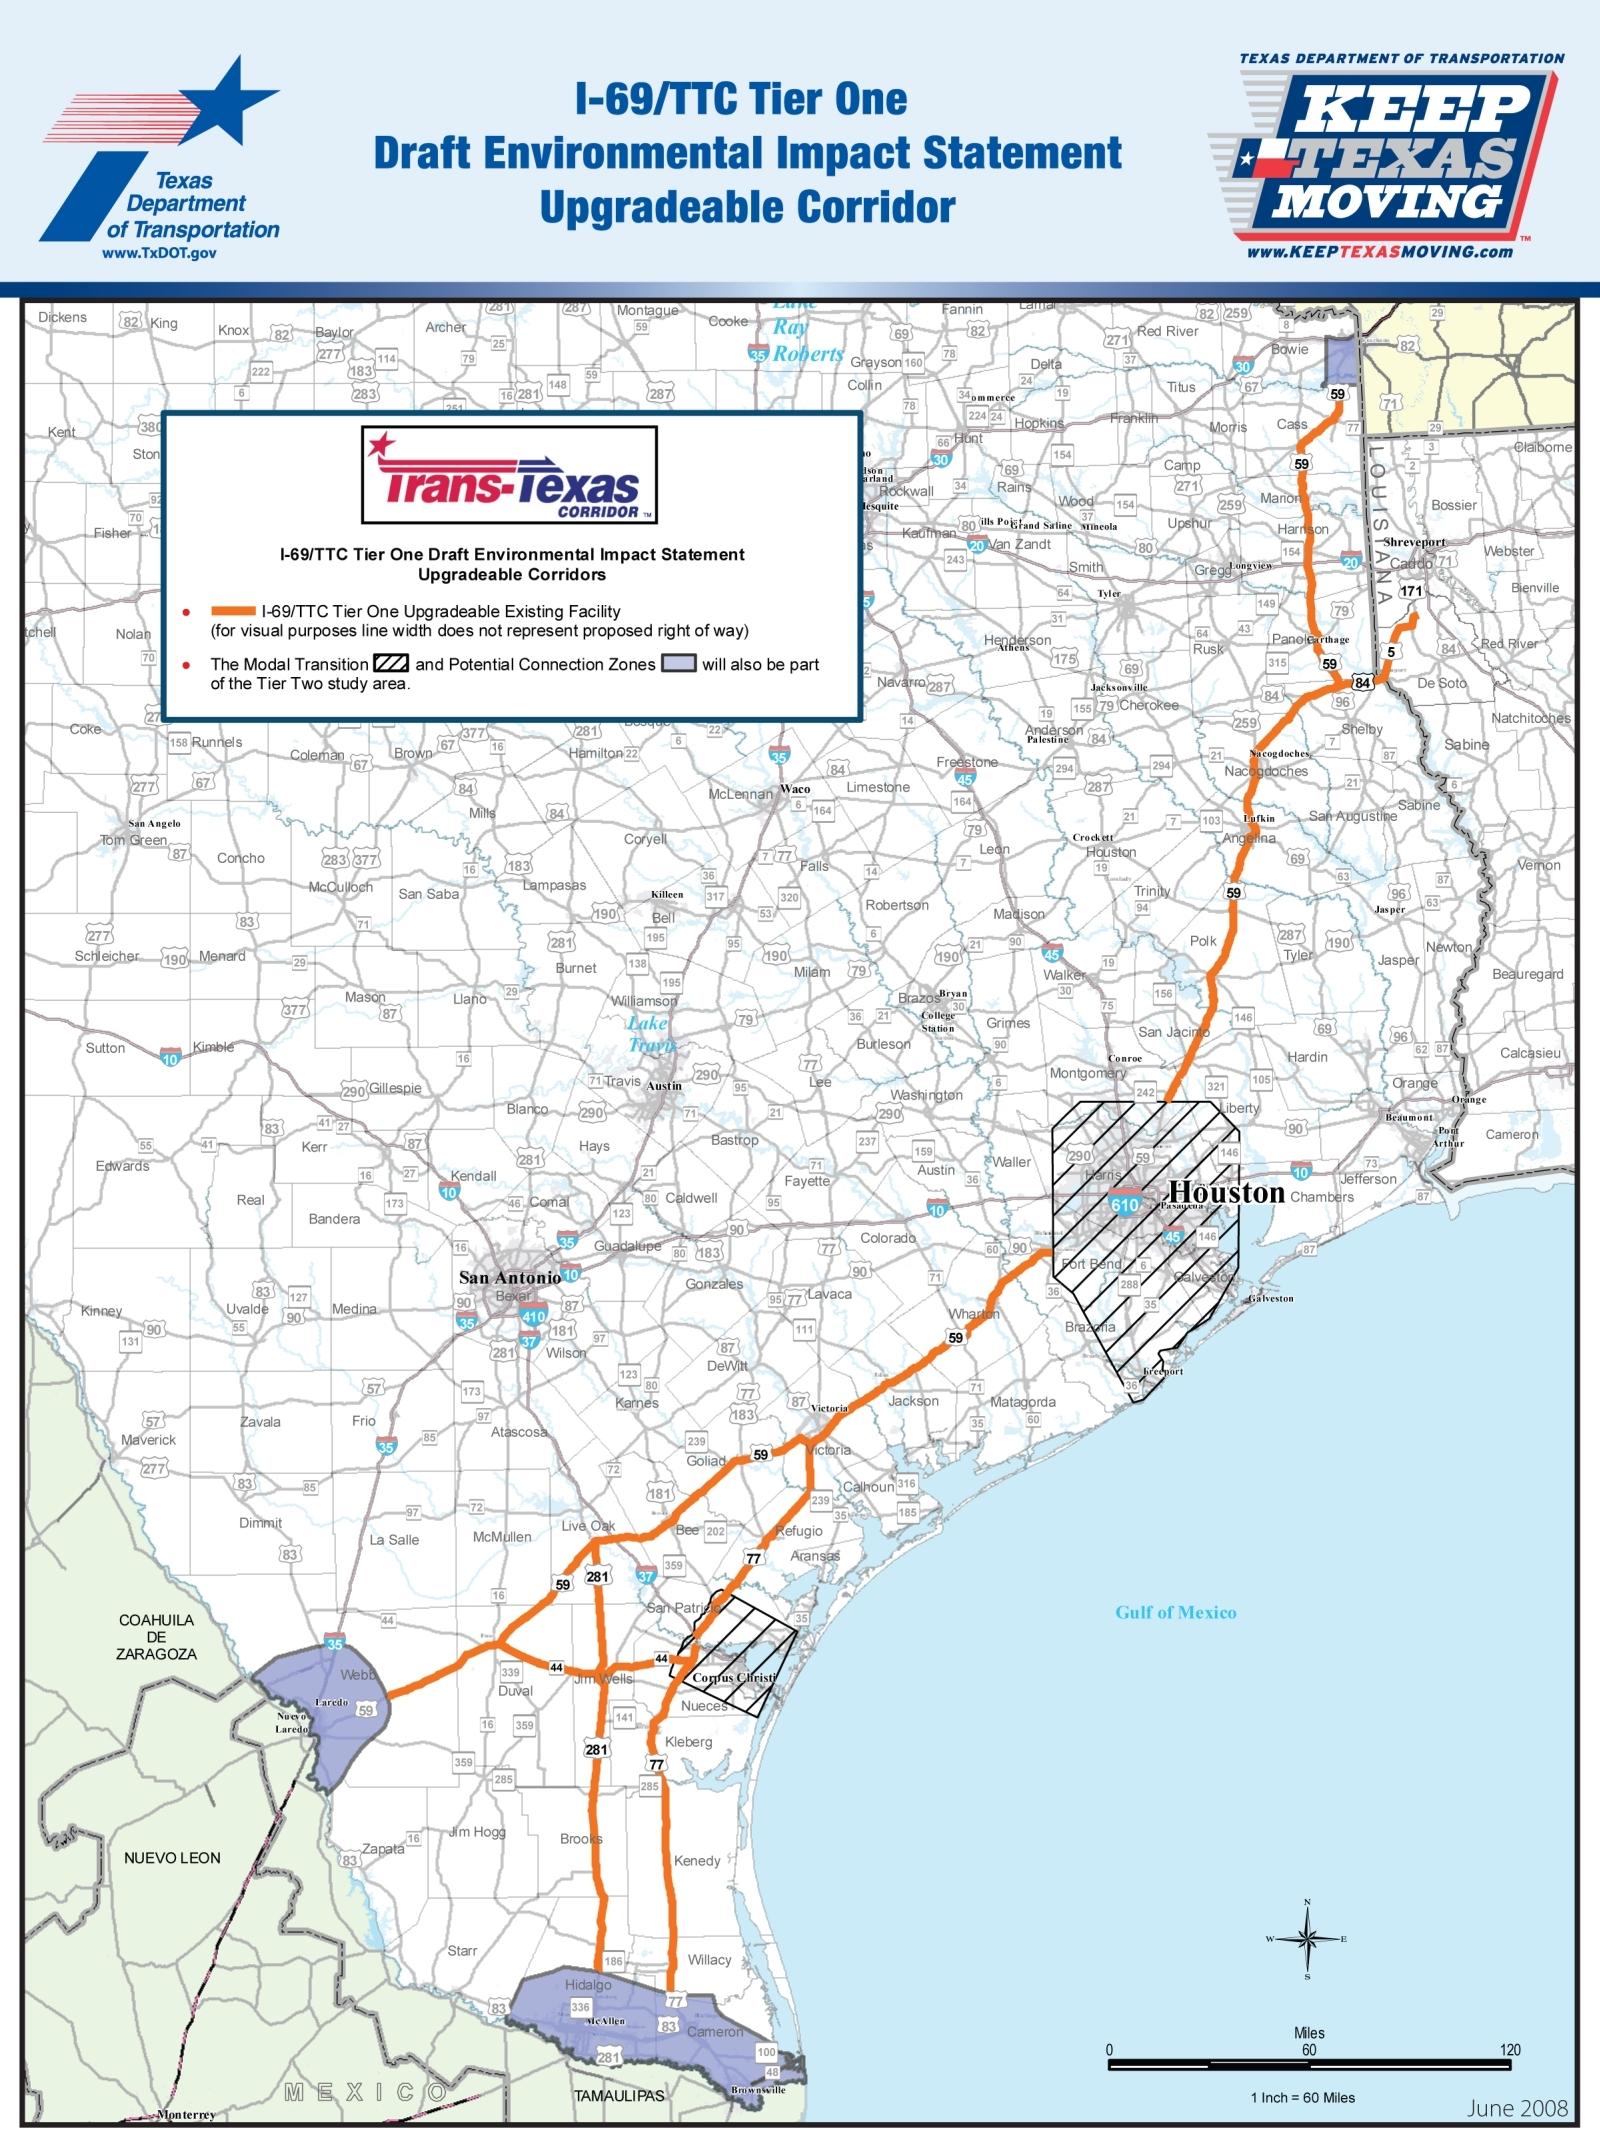 Map Of Interstate 69 In Texas.Map Of Interstate 69 In Texas Twitterleesclub